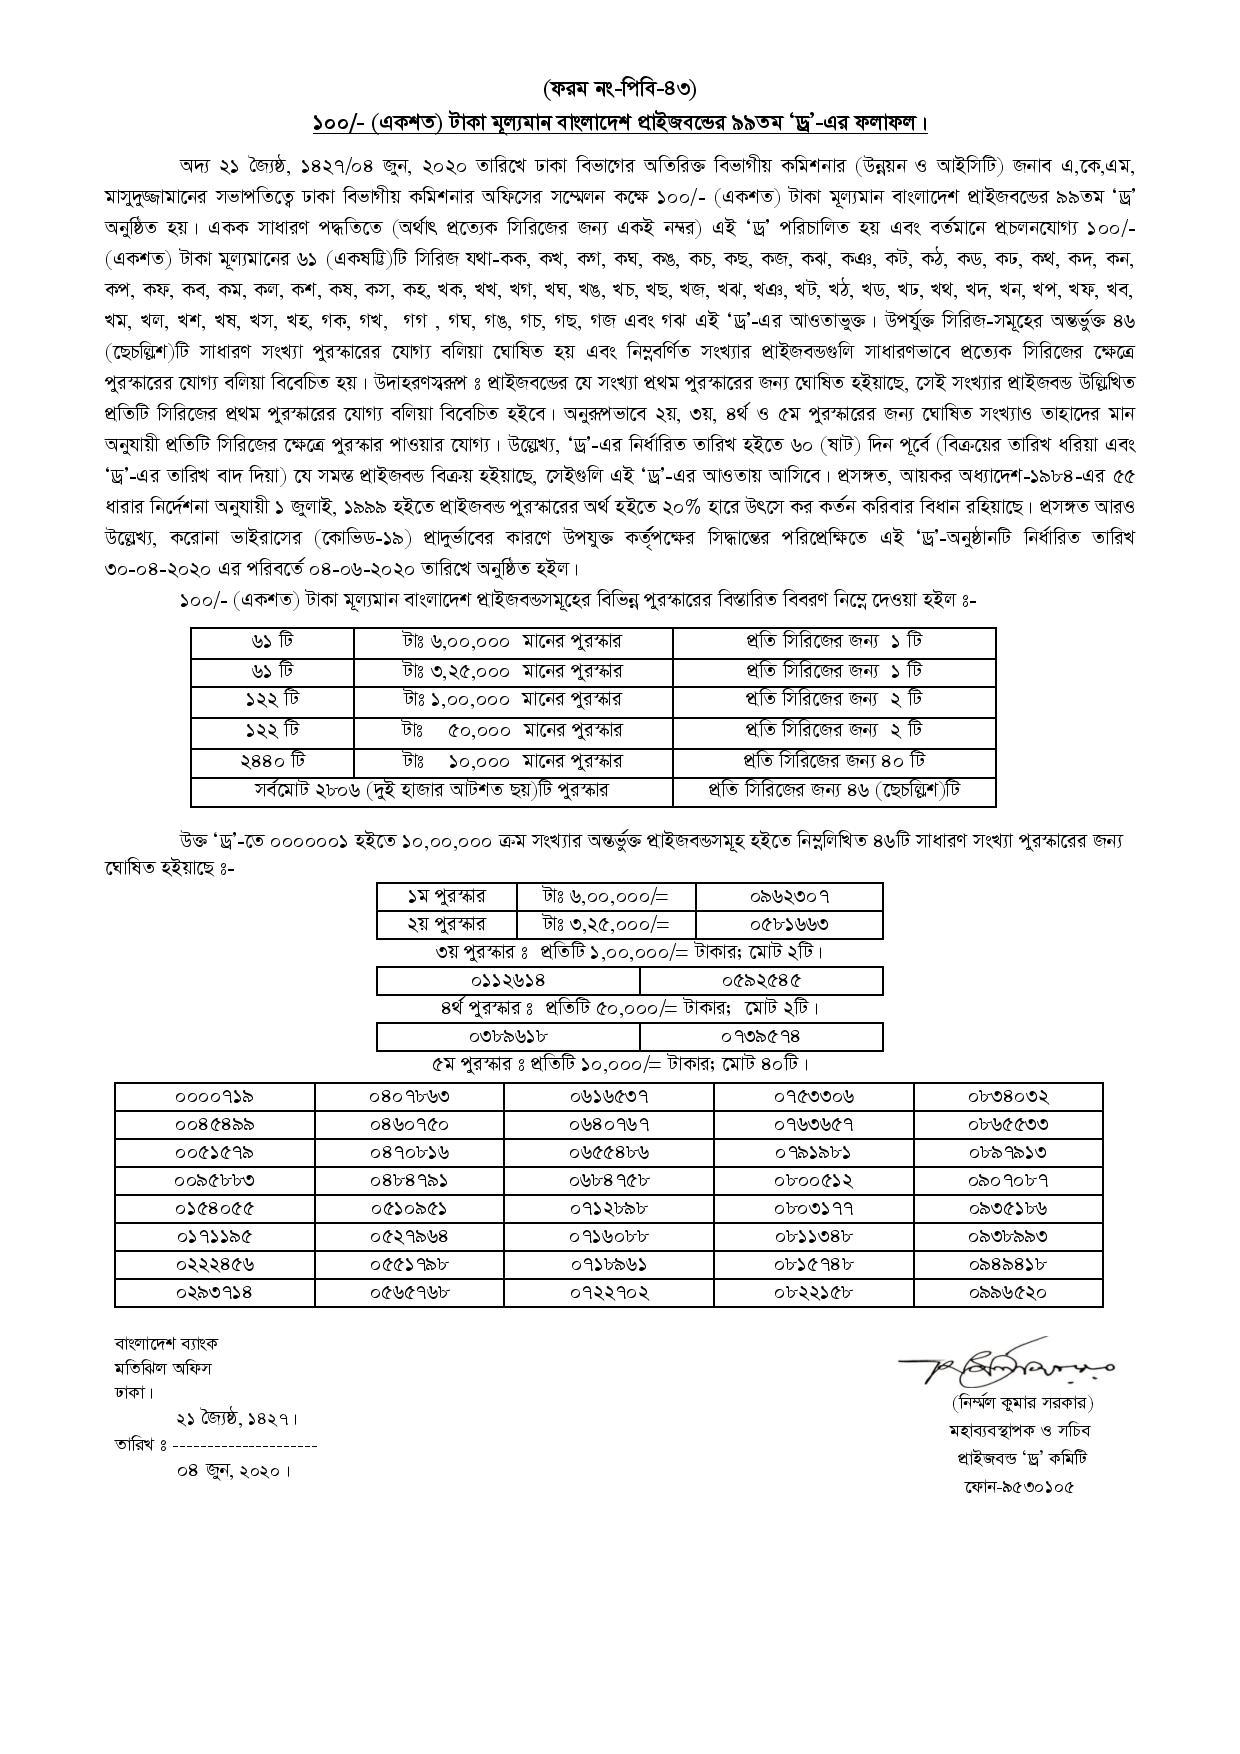 2020 06 08 09 29 bd78e06bc1ec134cb9abc933c2233470 page 001 - 101th Prize Bond Draw Result 2020 – Bangladesh Bank 100 Taka PrizeBond Draw